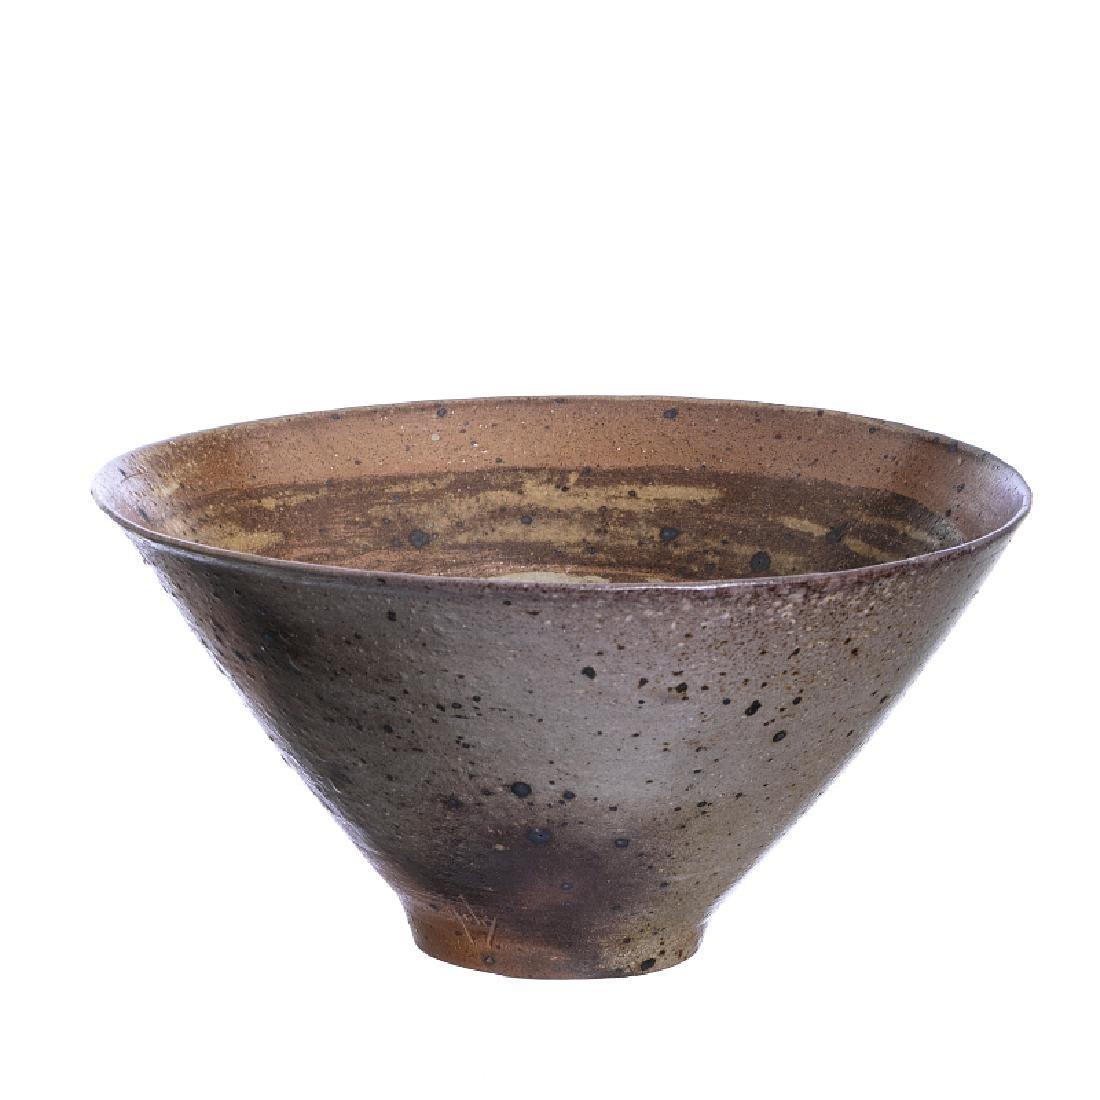 YVES MOHY (1929-2005) - Large Stoneware bowl